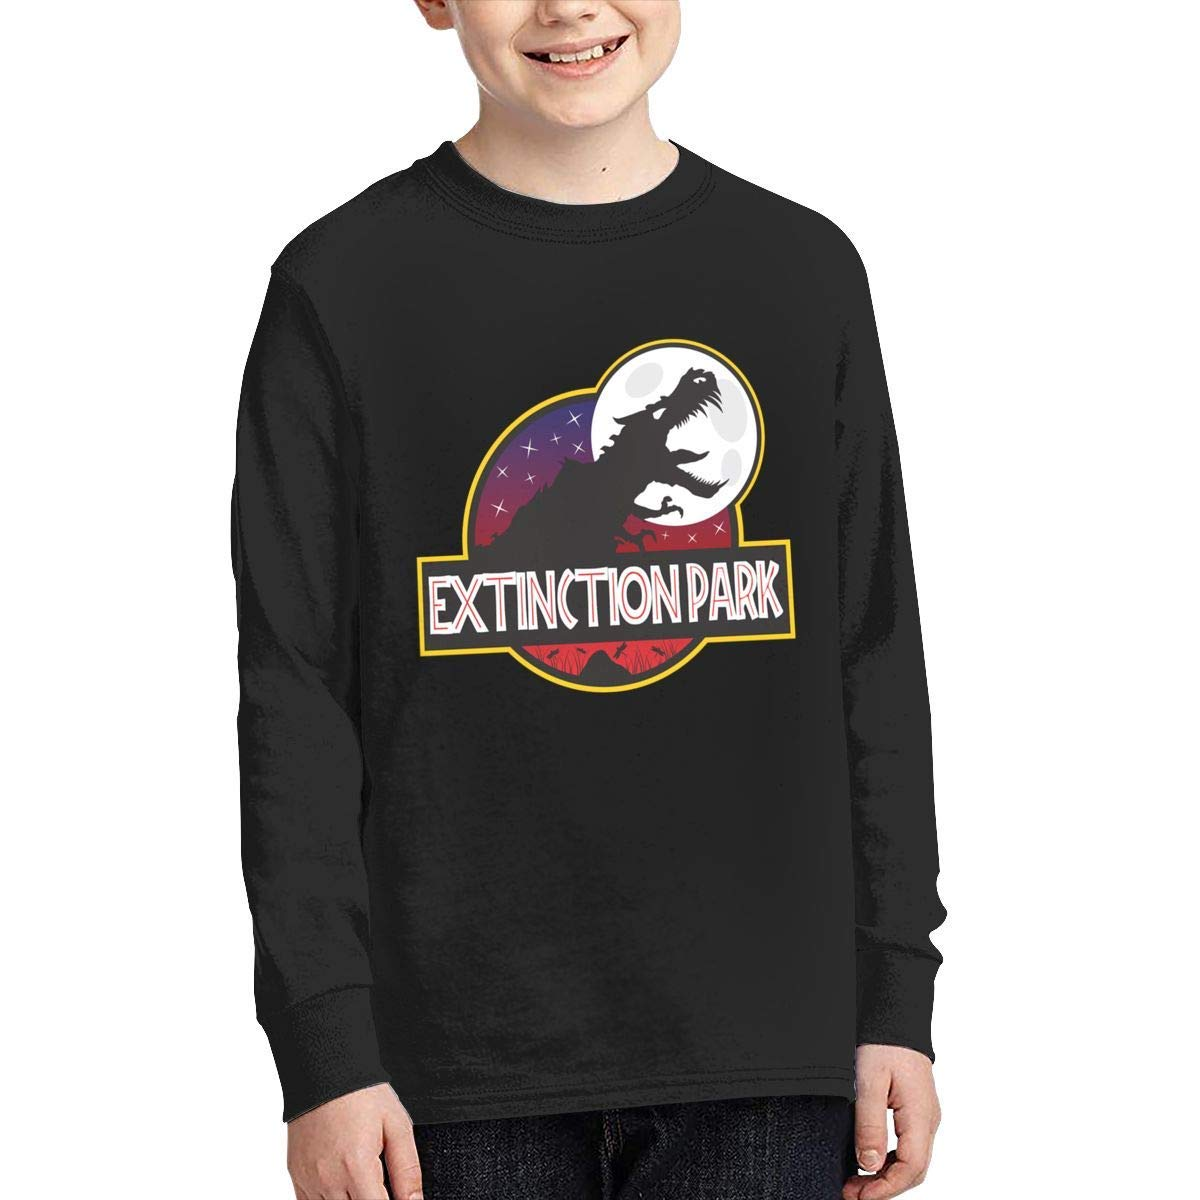 Kilsd Boys /& Girls Junior Particular Extinction Park Jurassic Park Logo Long Sleeve T-Shirt Black